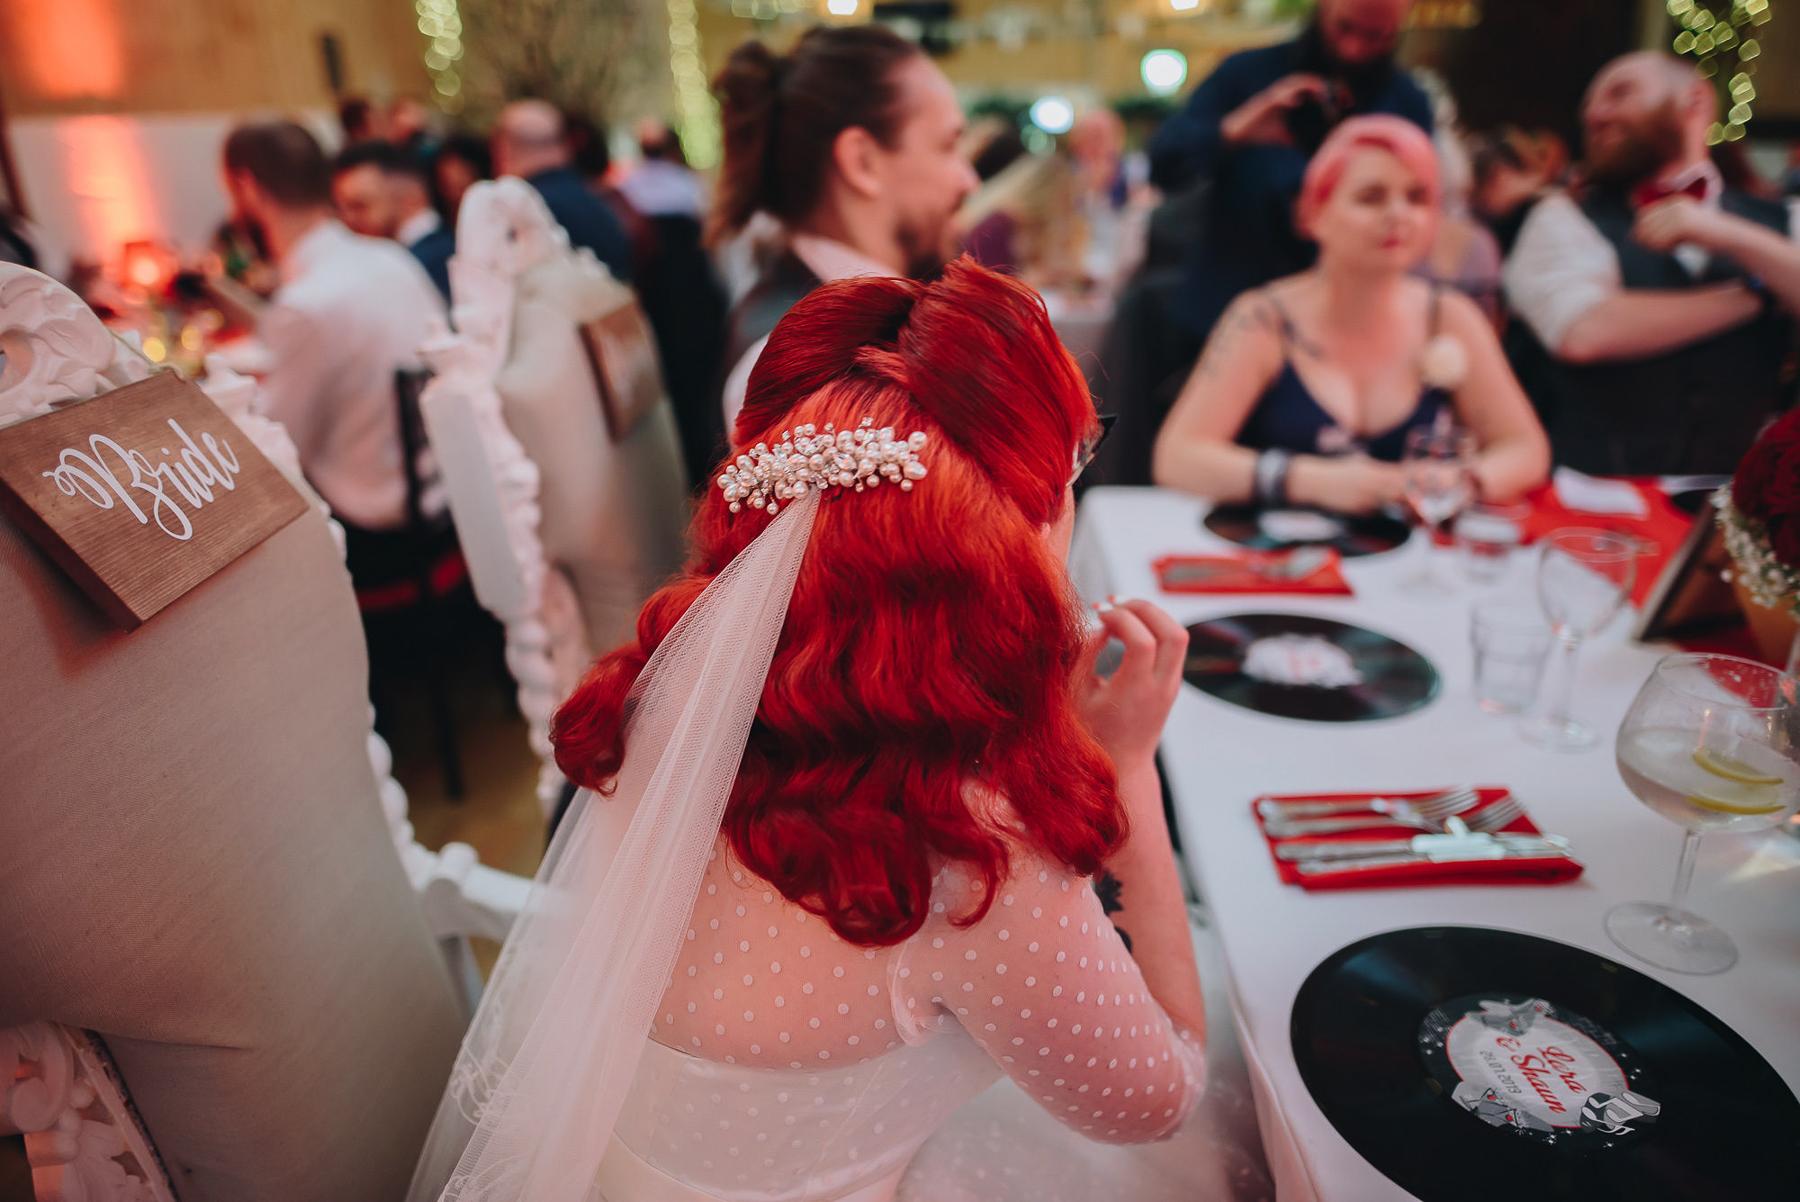 Wellbeing_Farm_Wedding_Photography_The_Pin-Up_Bride_Lara_Shaun-122.jpg